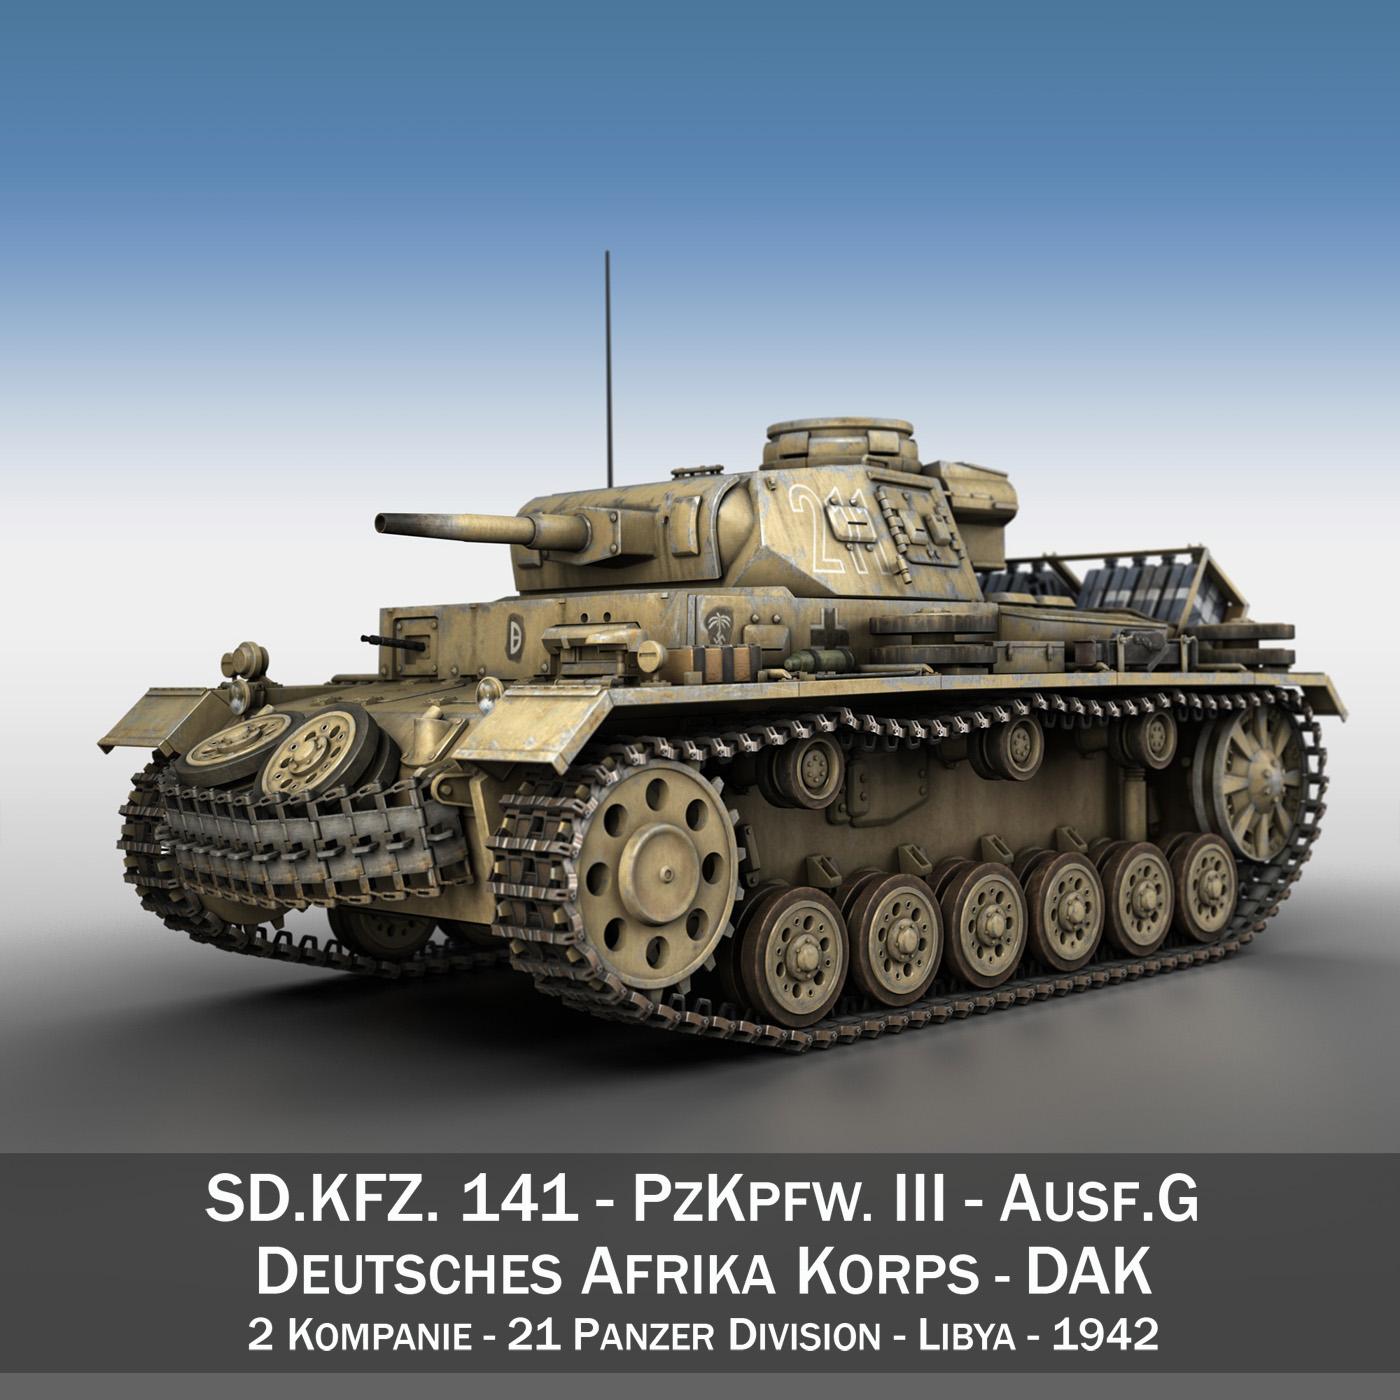 pzkpfw iii – panzer 3 – ausf.g – dak – 211 3d model 3ds c4d fbx lwo lw lws obj 266462